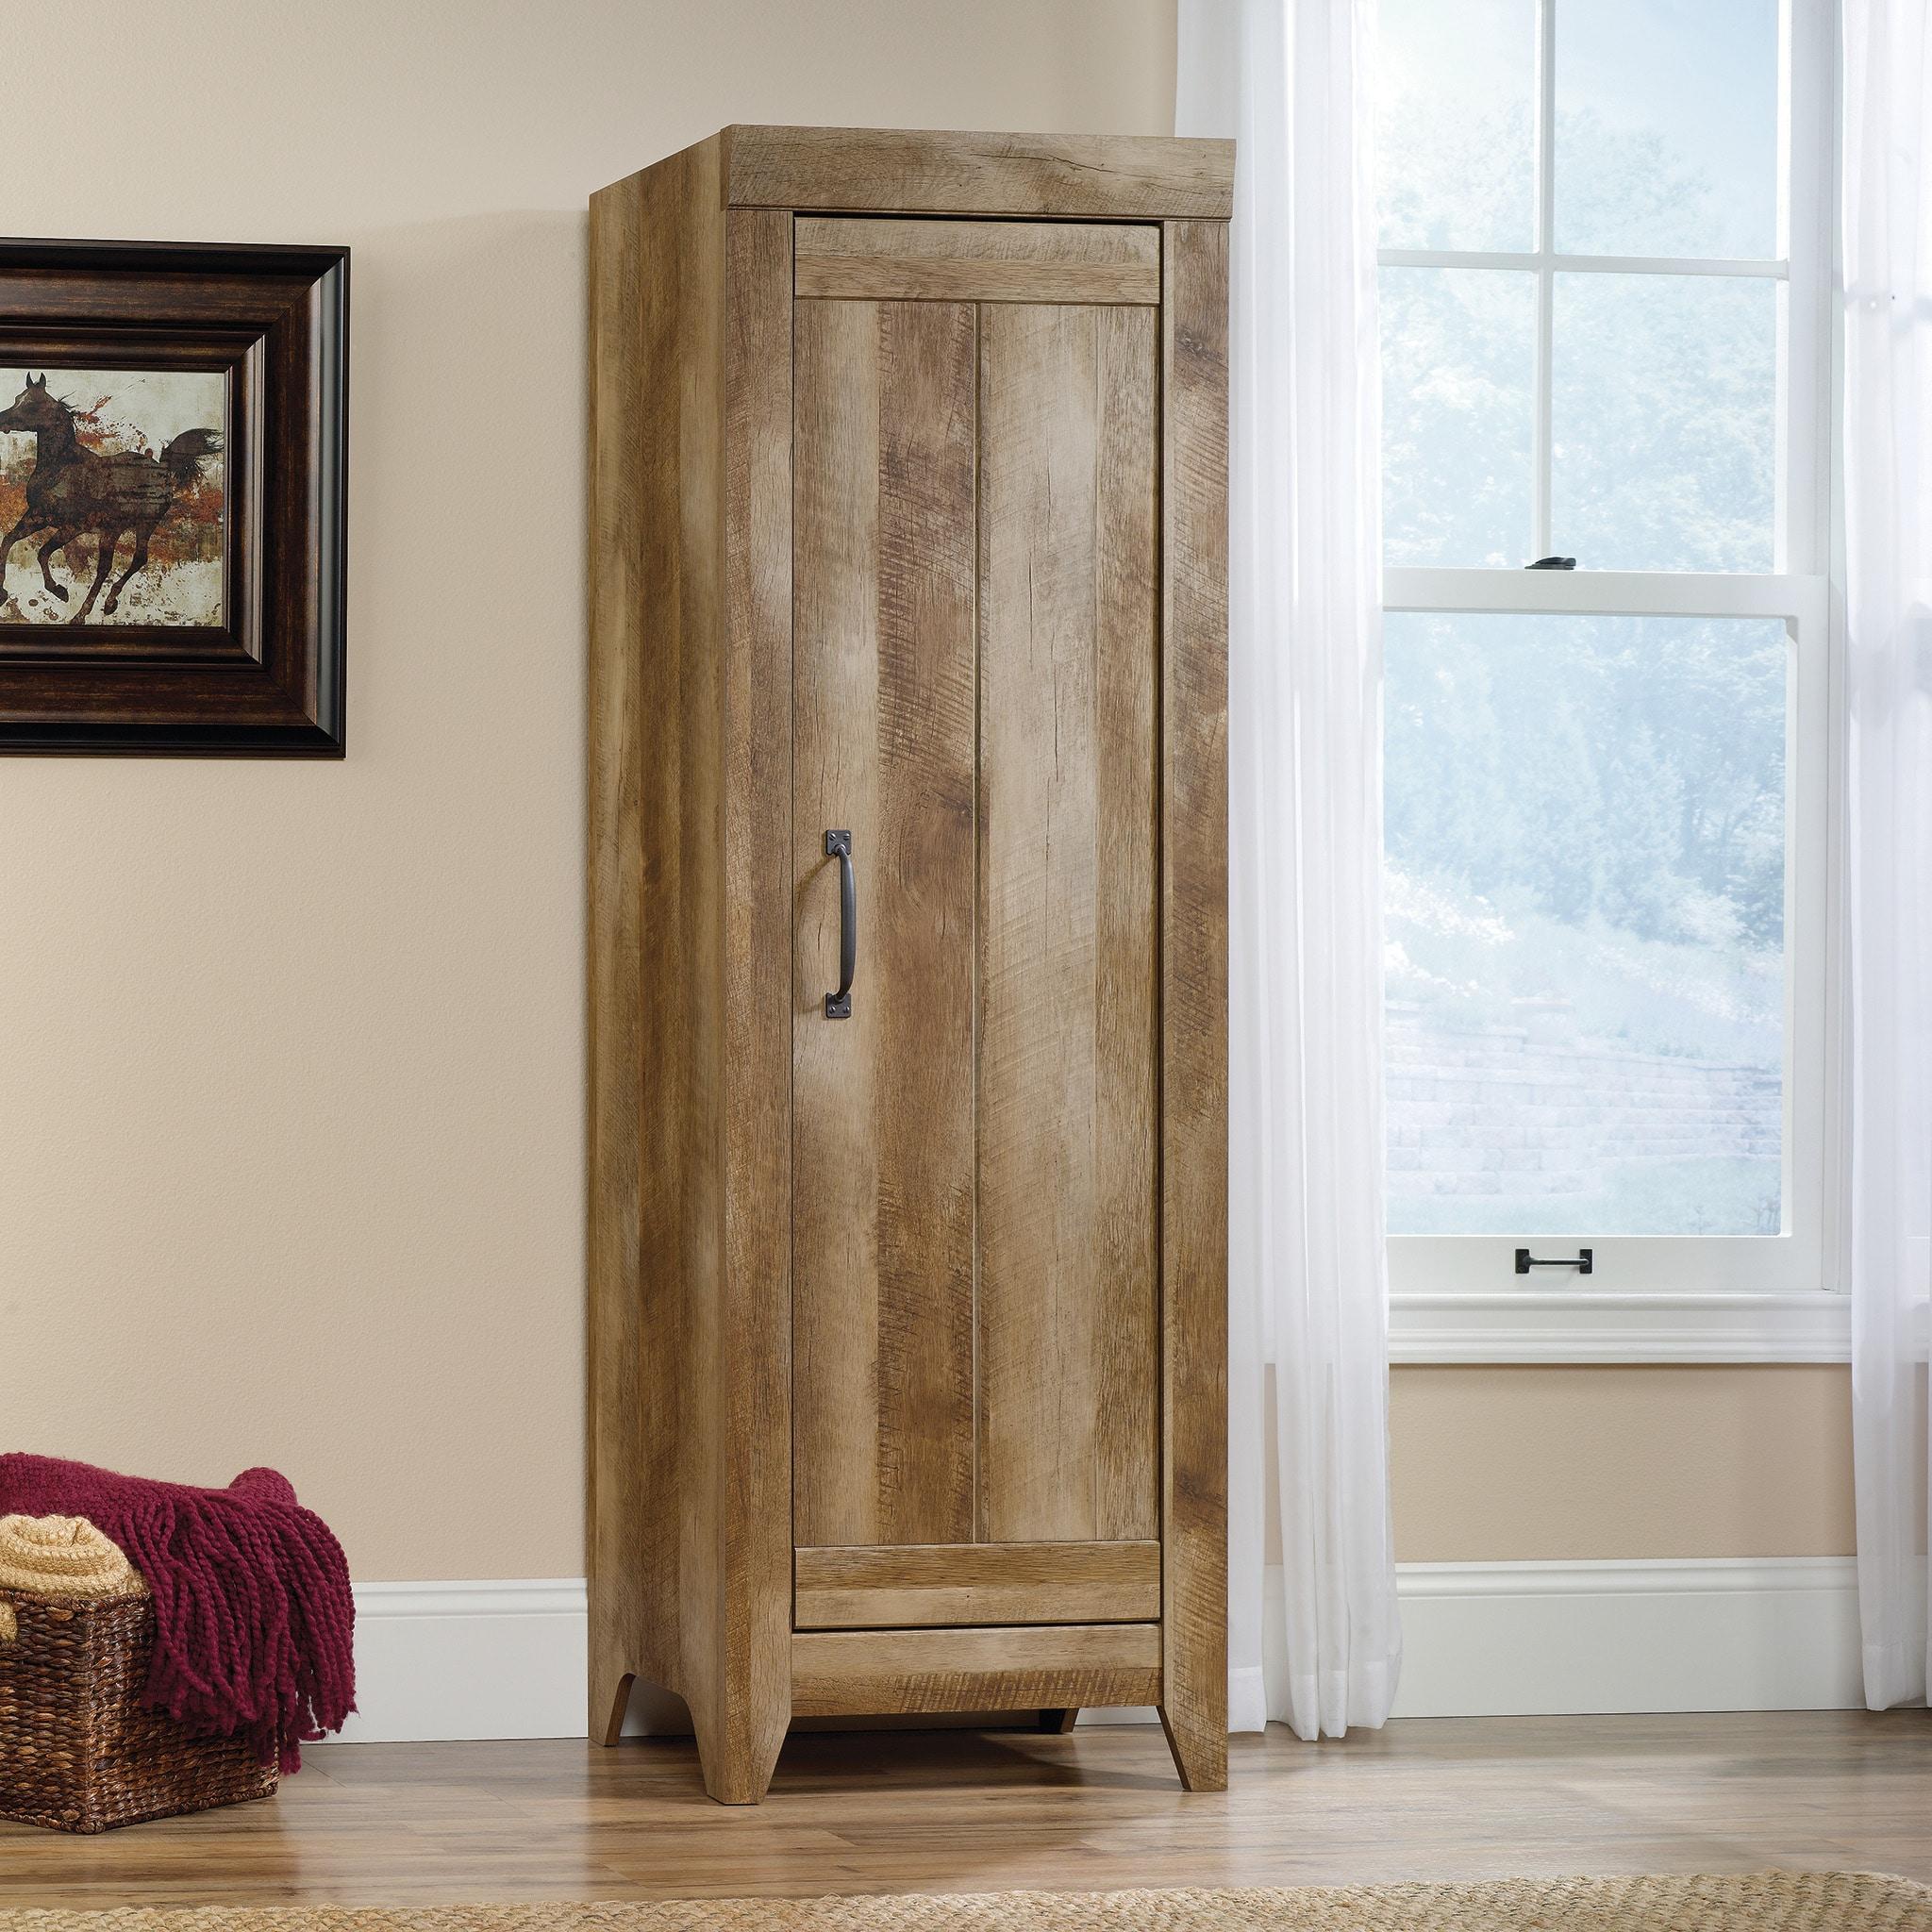 Adept Narrow Storage Cabinet - Craftsman Oak